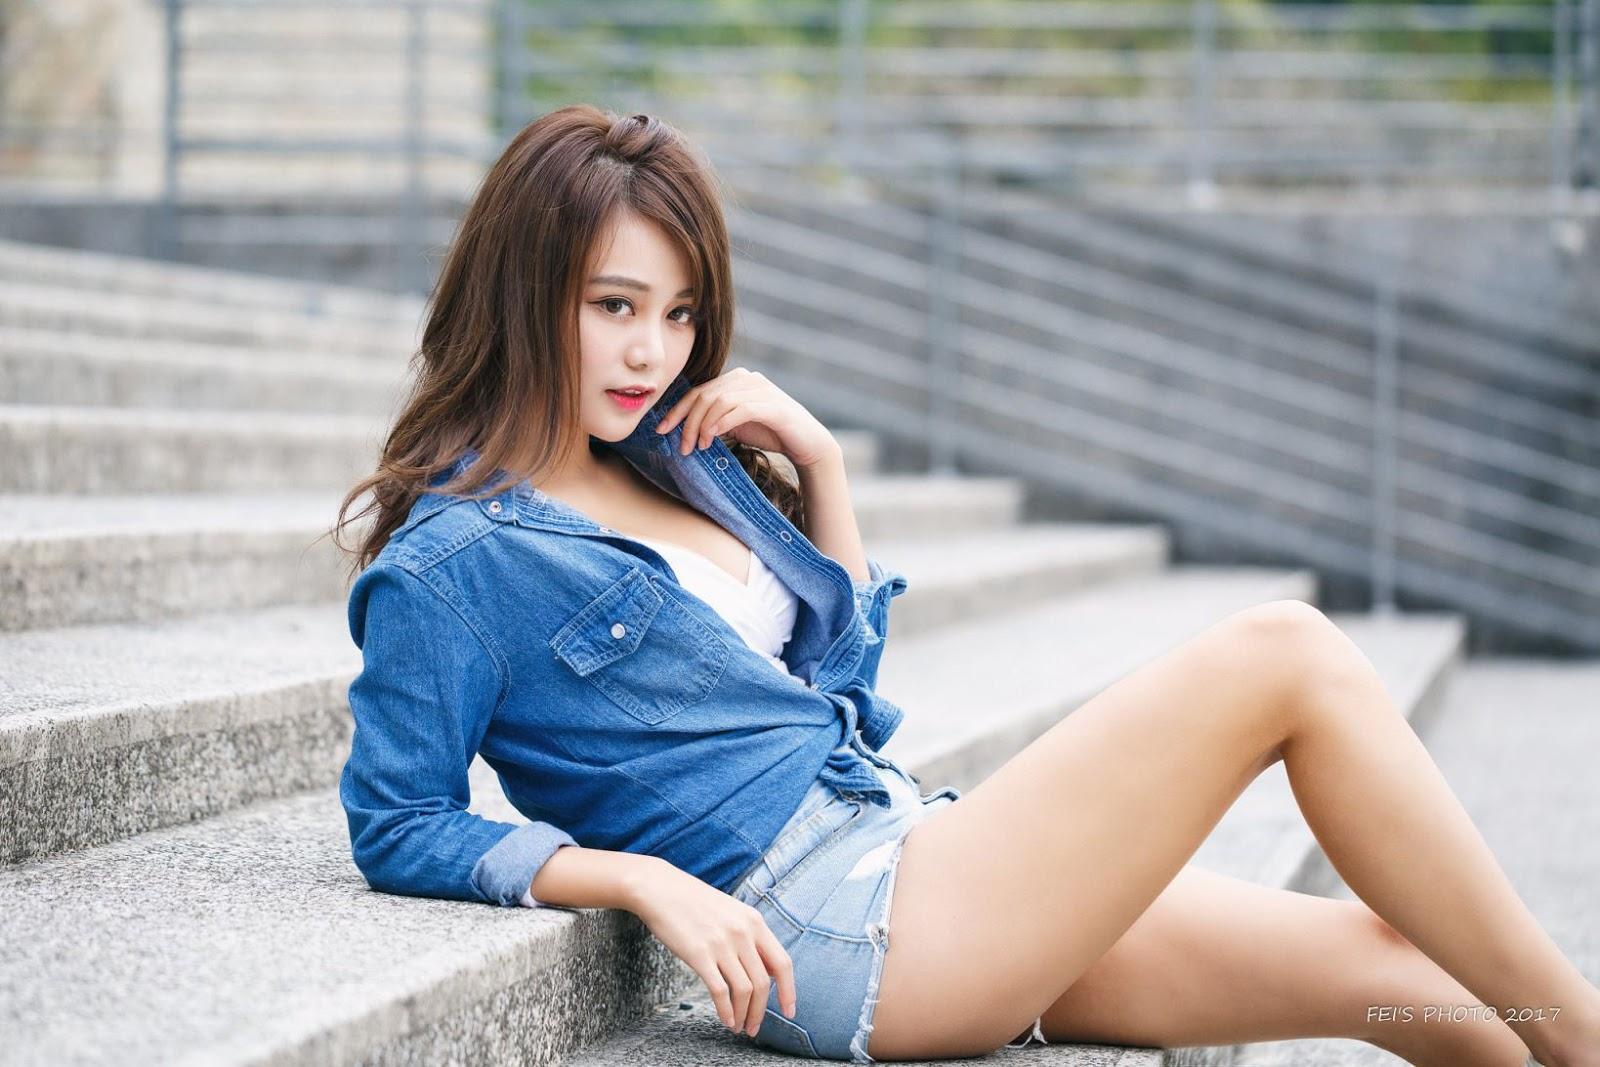 Sun Hui Tong - 孫卉彤 - 2019.02.27 - Gome Hall - TruePic.net